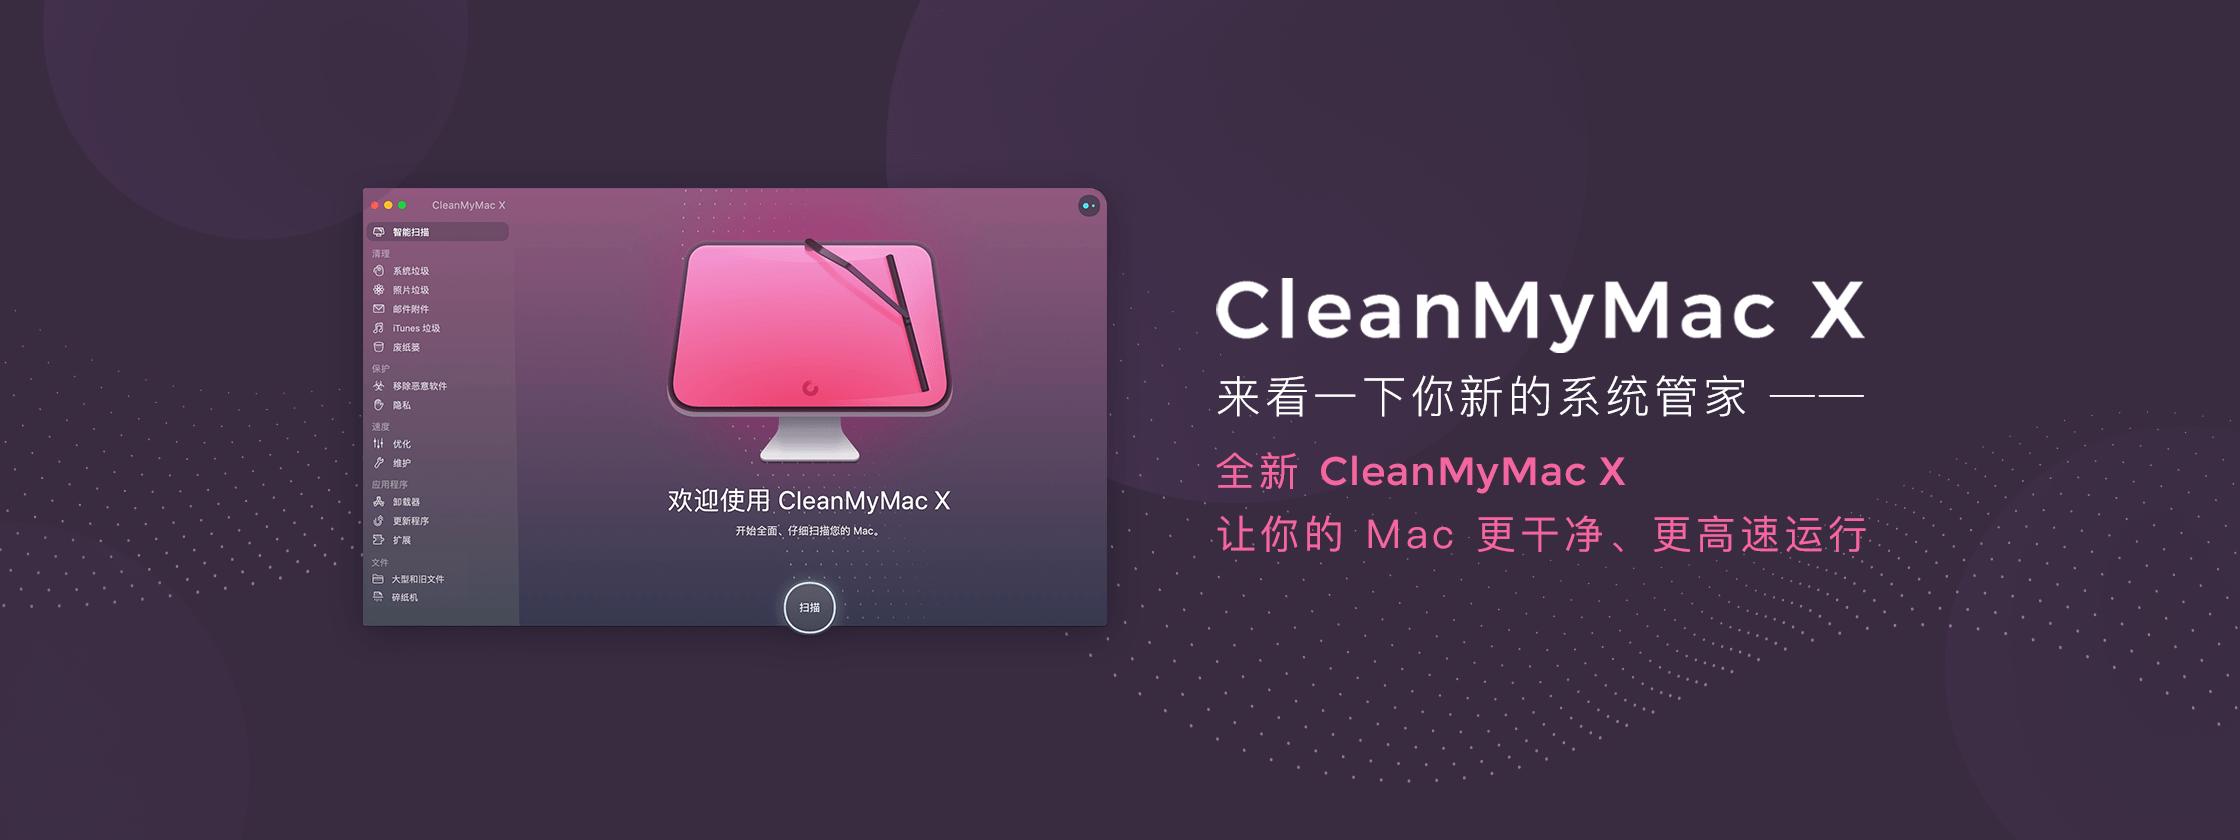 CleanMyMac X,全新的 Mac 系统优化与整理利器